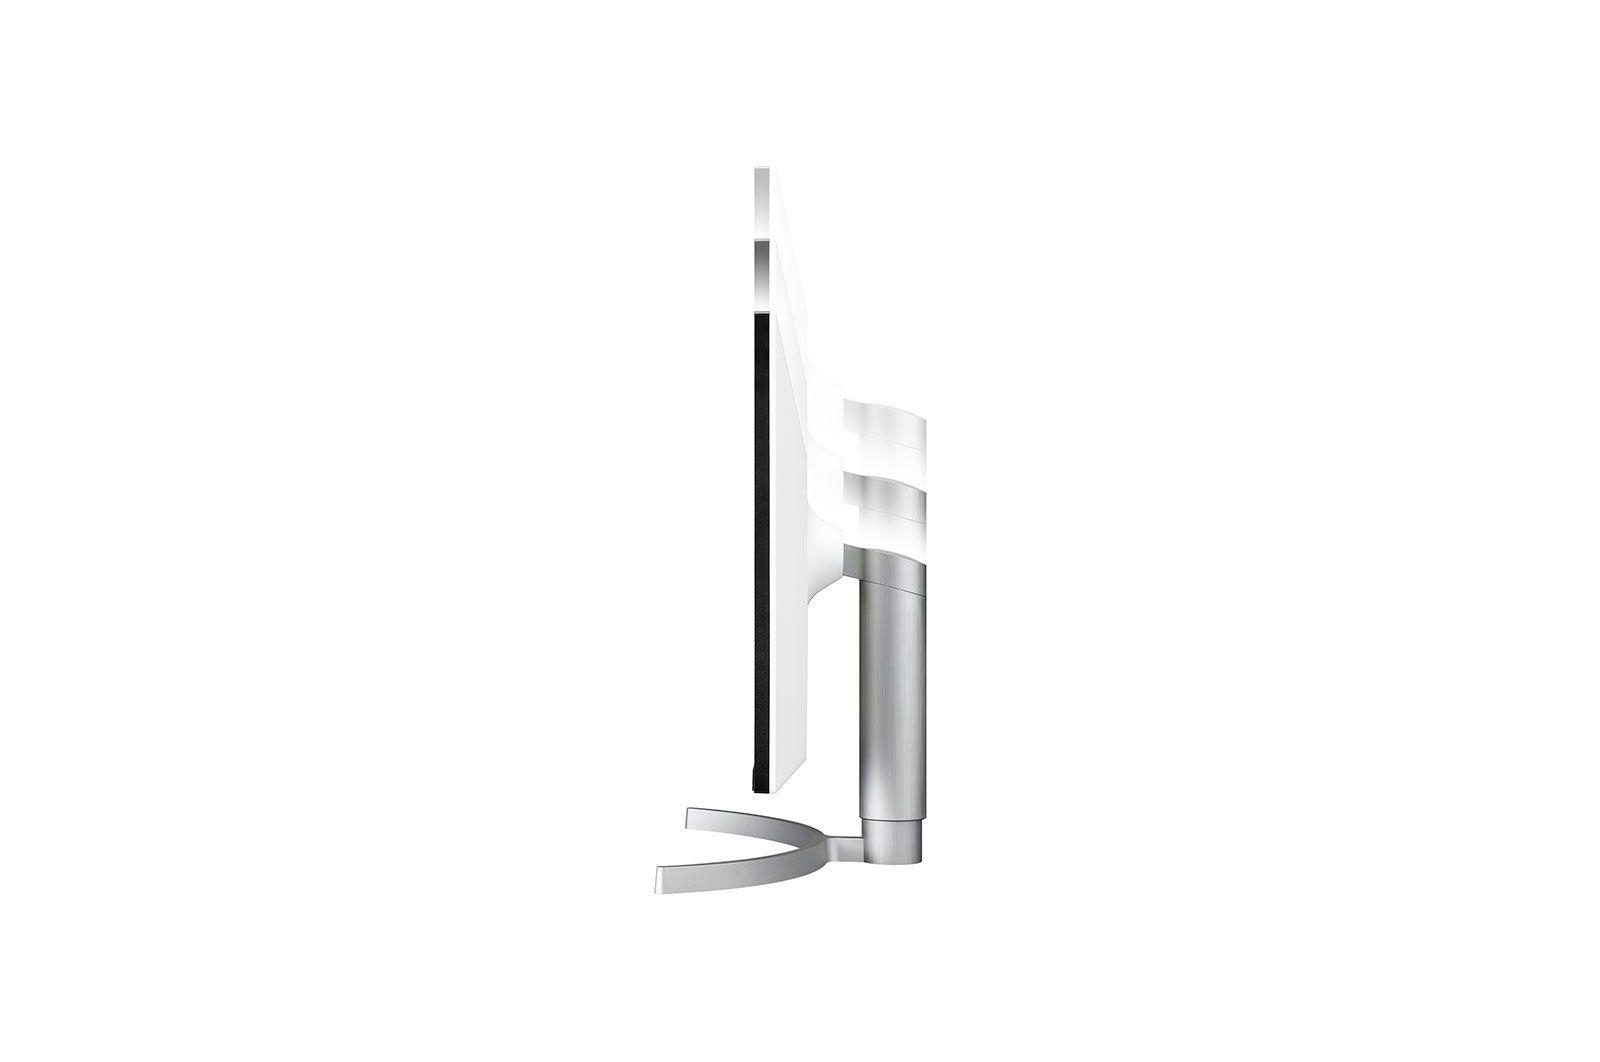 Monitor LG LED 27´ Widescreen 4K IPS Ajuste de Altura Branco - 27UL650-W